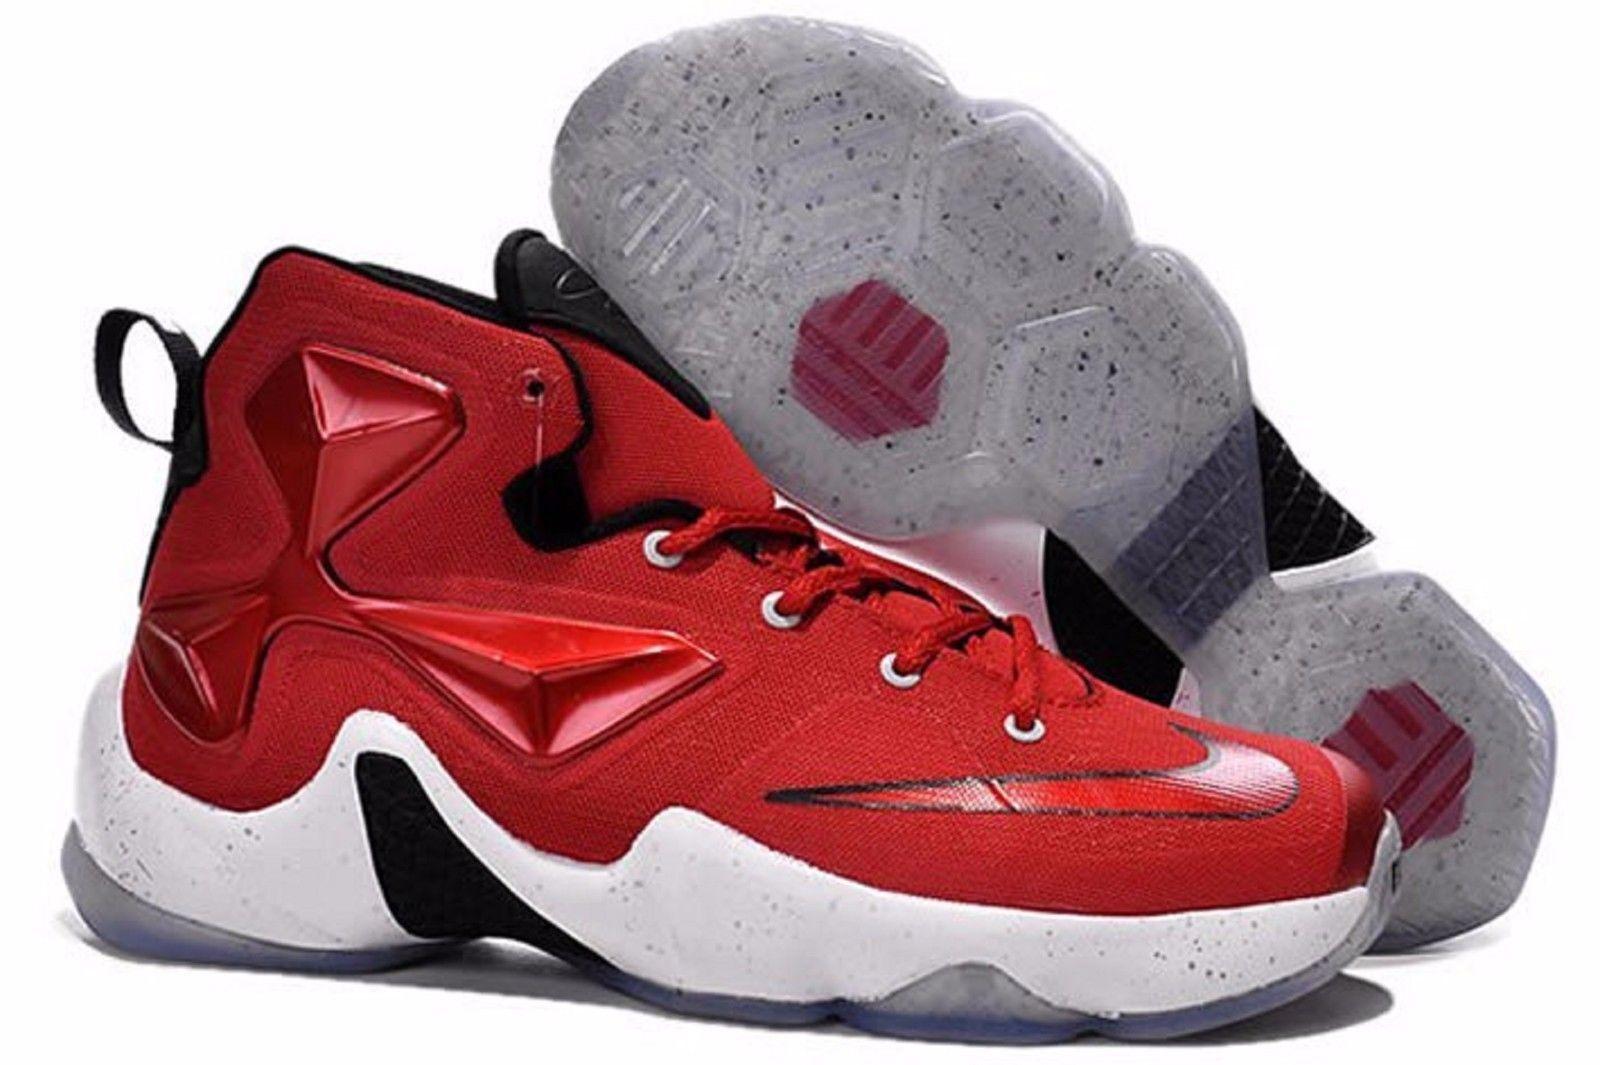 New Men's Nike Lebron XIII Shoes (807219-610)  University Red/White-Black-Laser